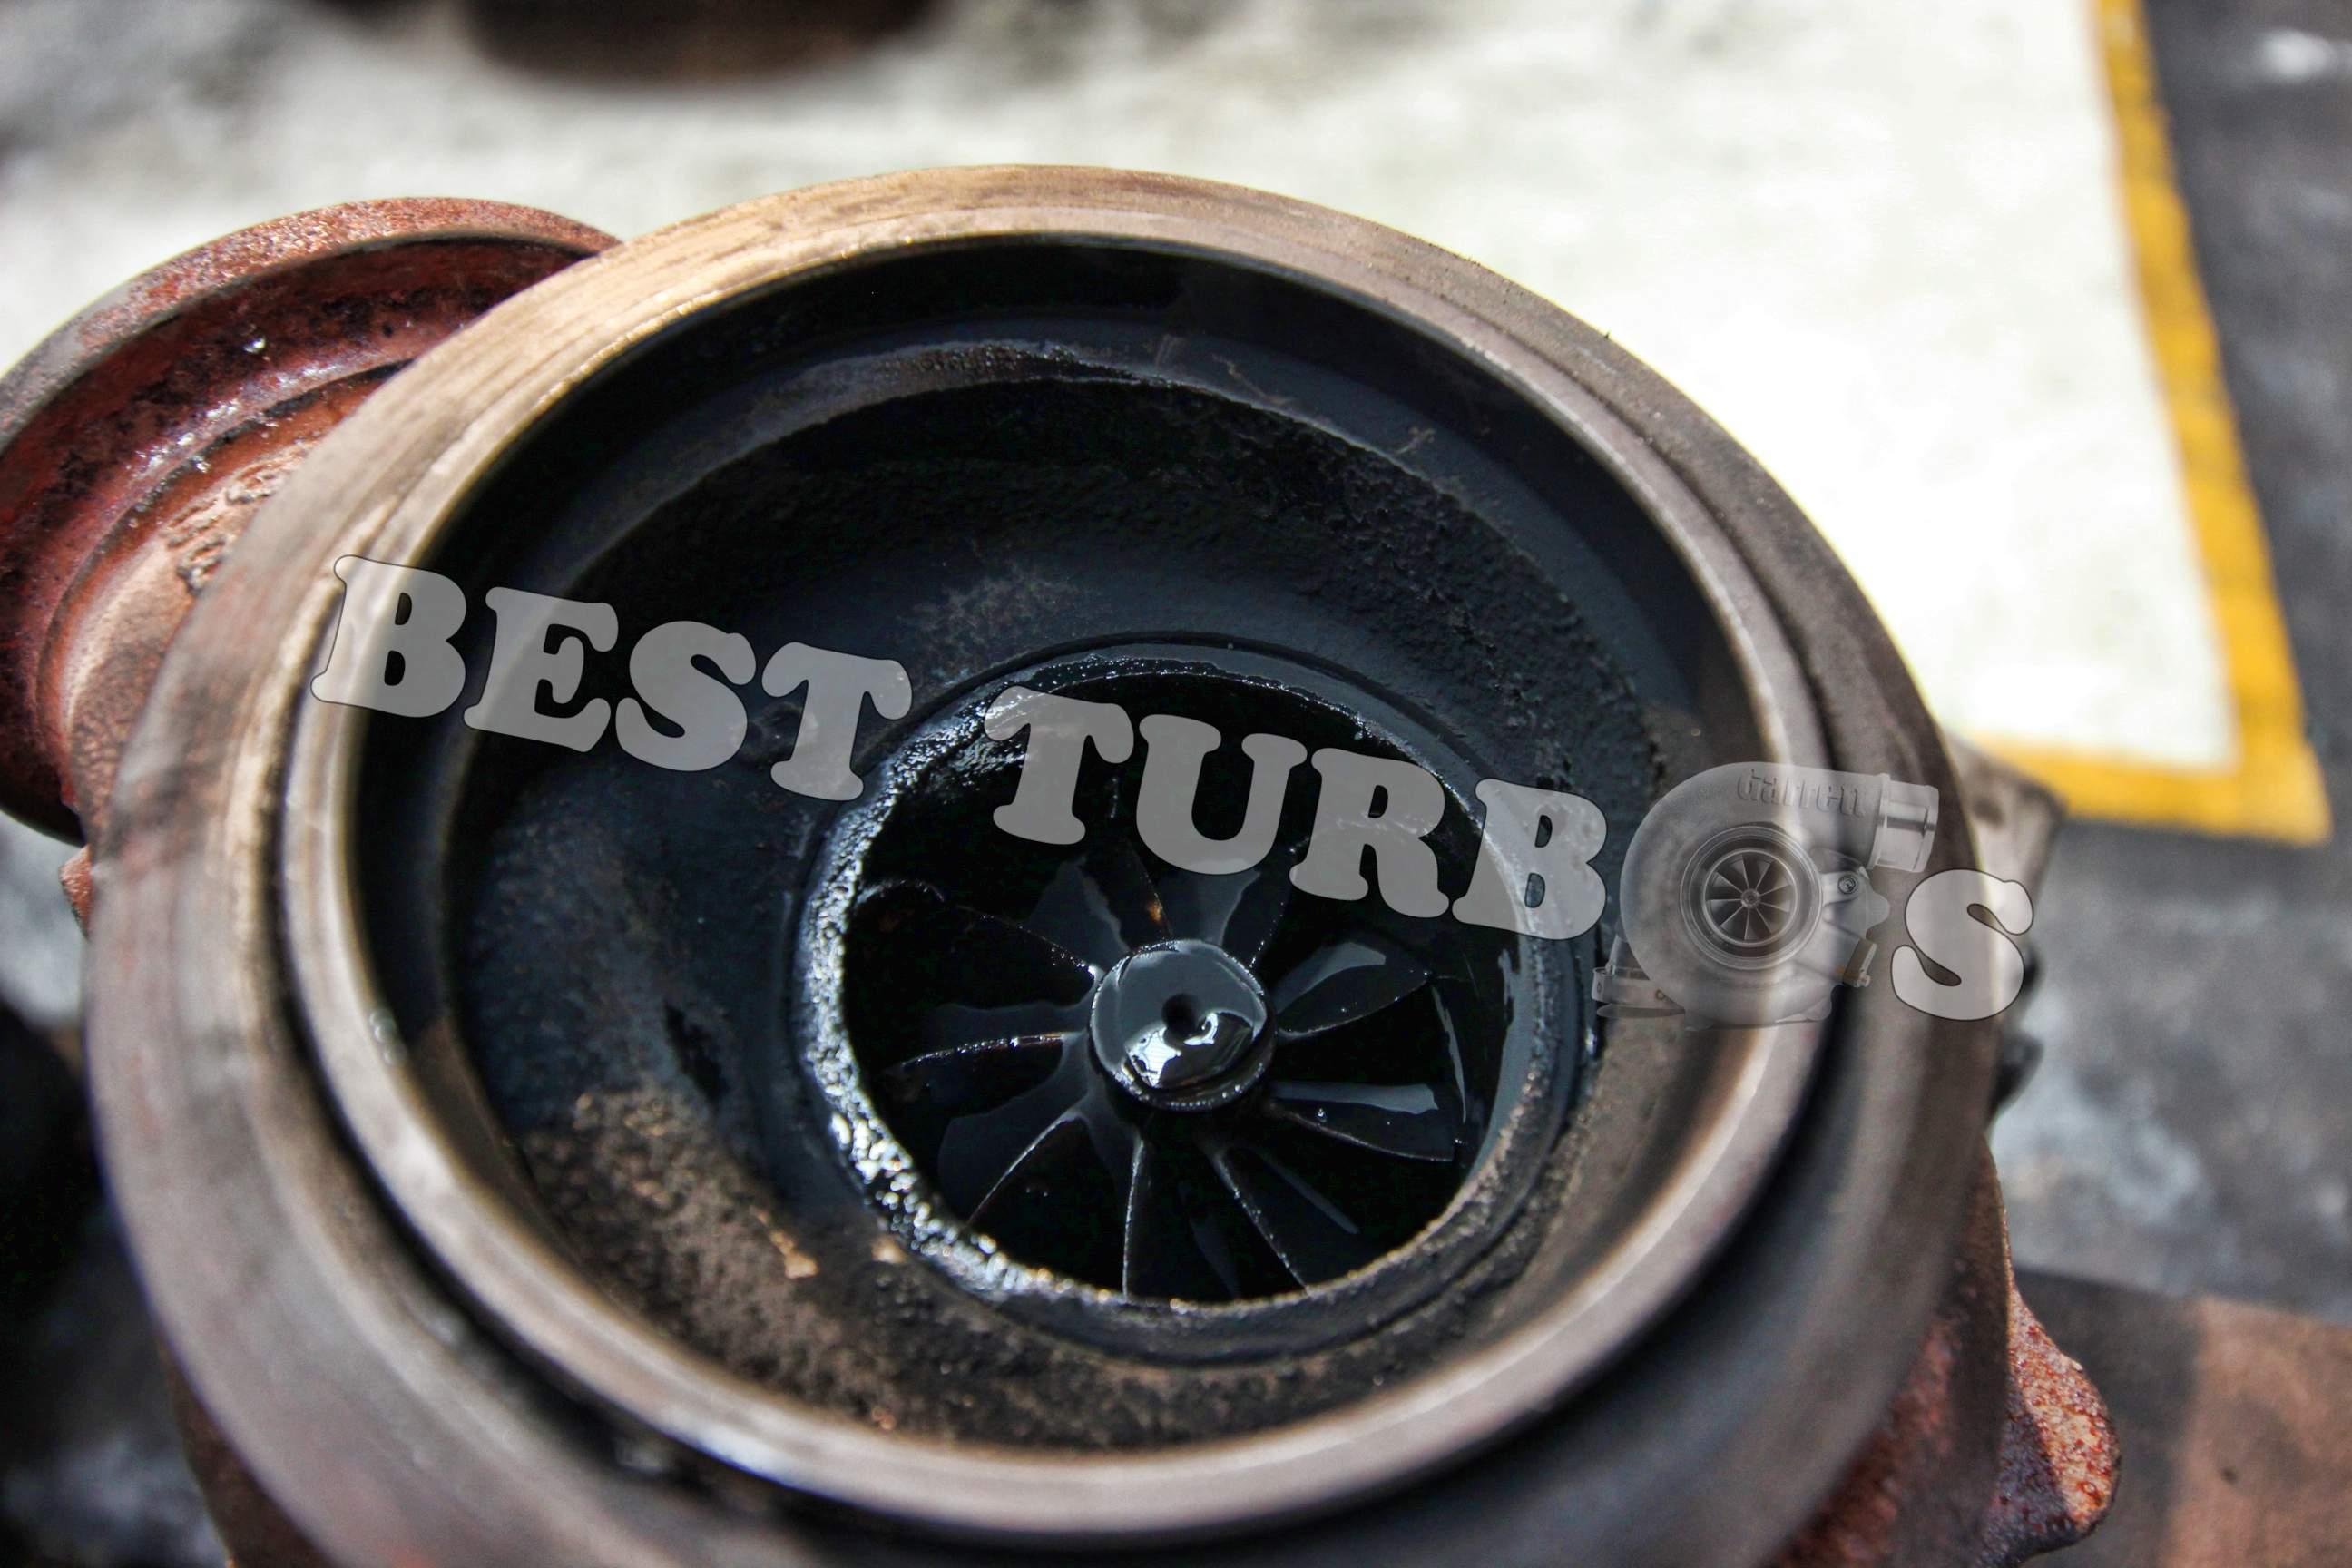 BMW X5 Turbo Replacement Reconditioning Rebuild Repairs Problem